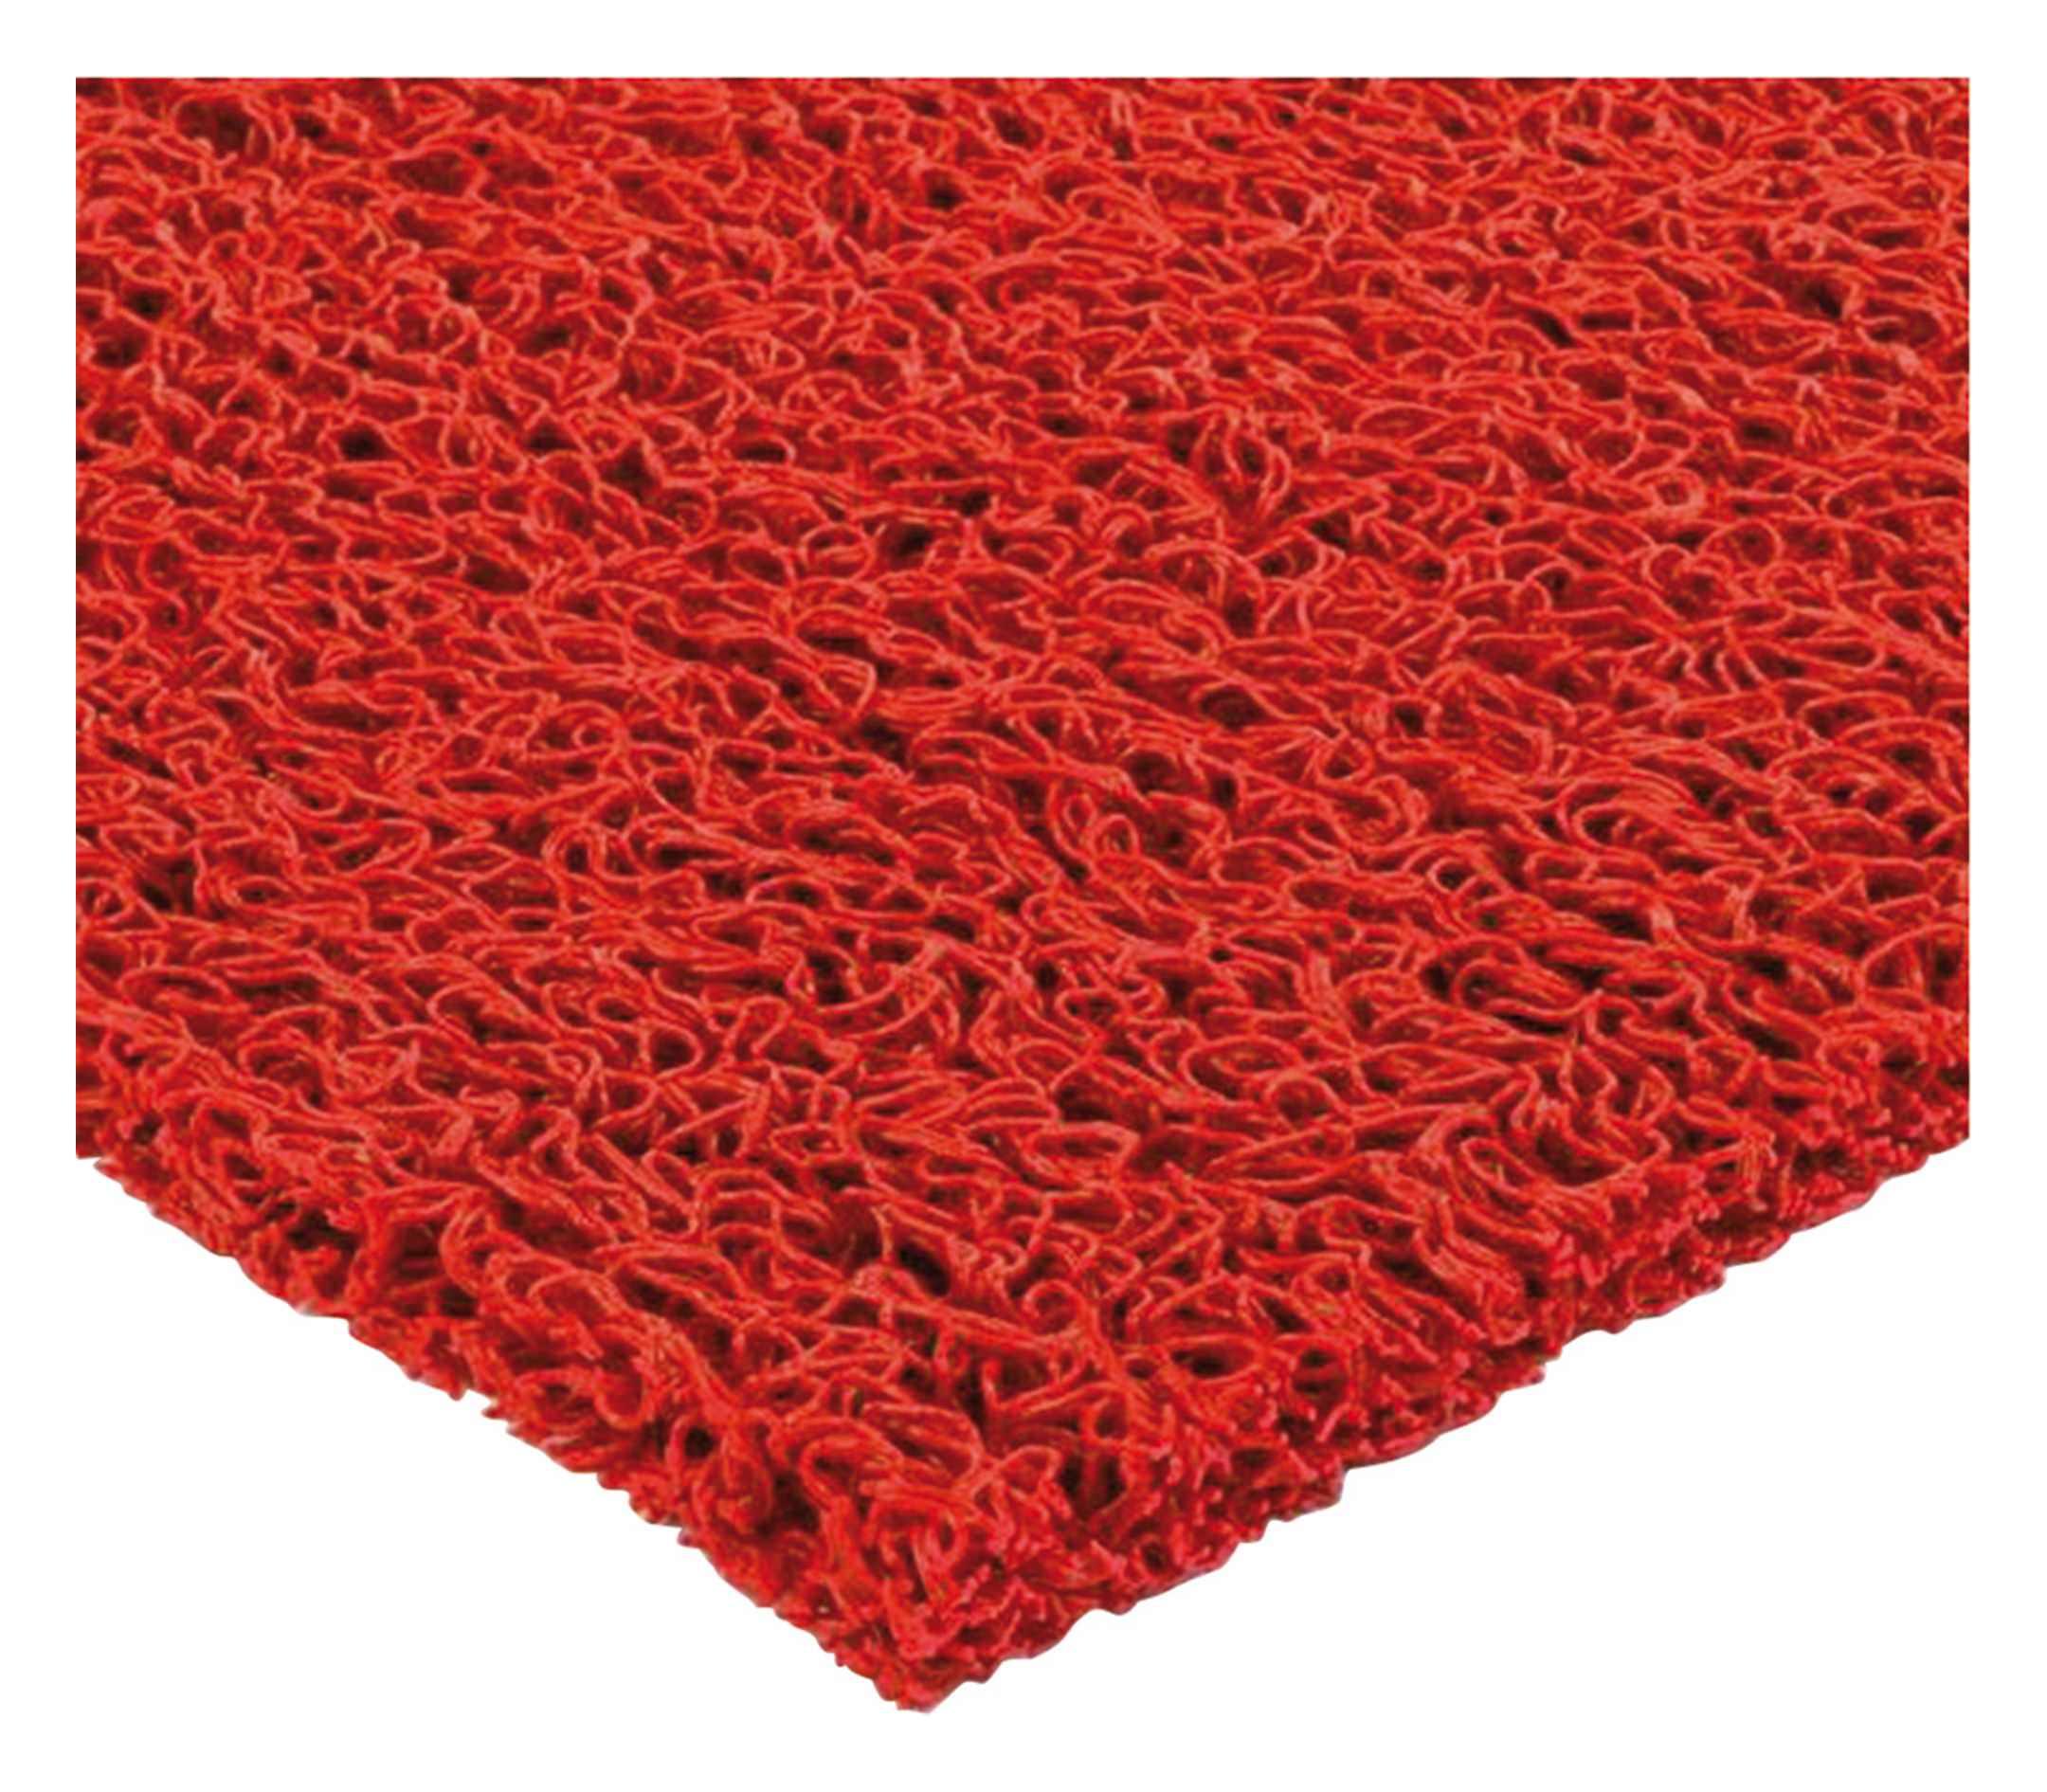 Spaghetti-Fußmatte 14mm 1,2 x 12m rot